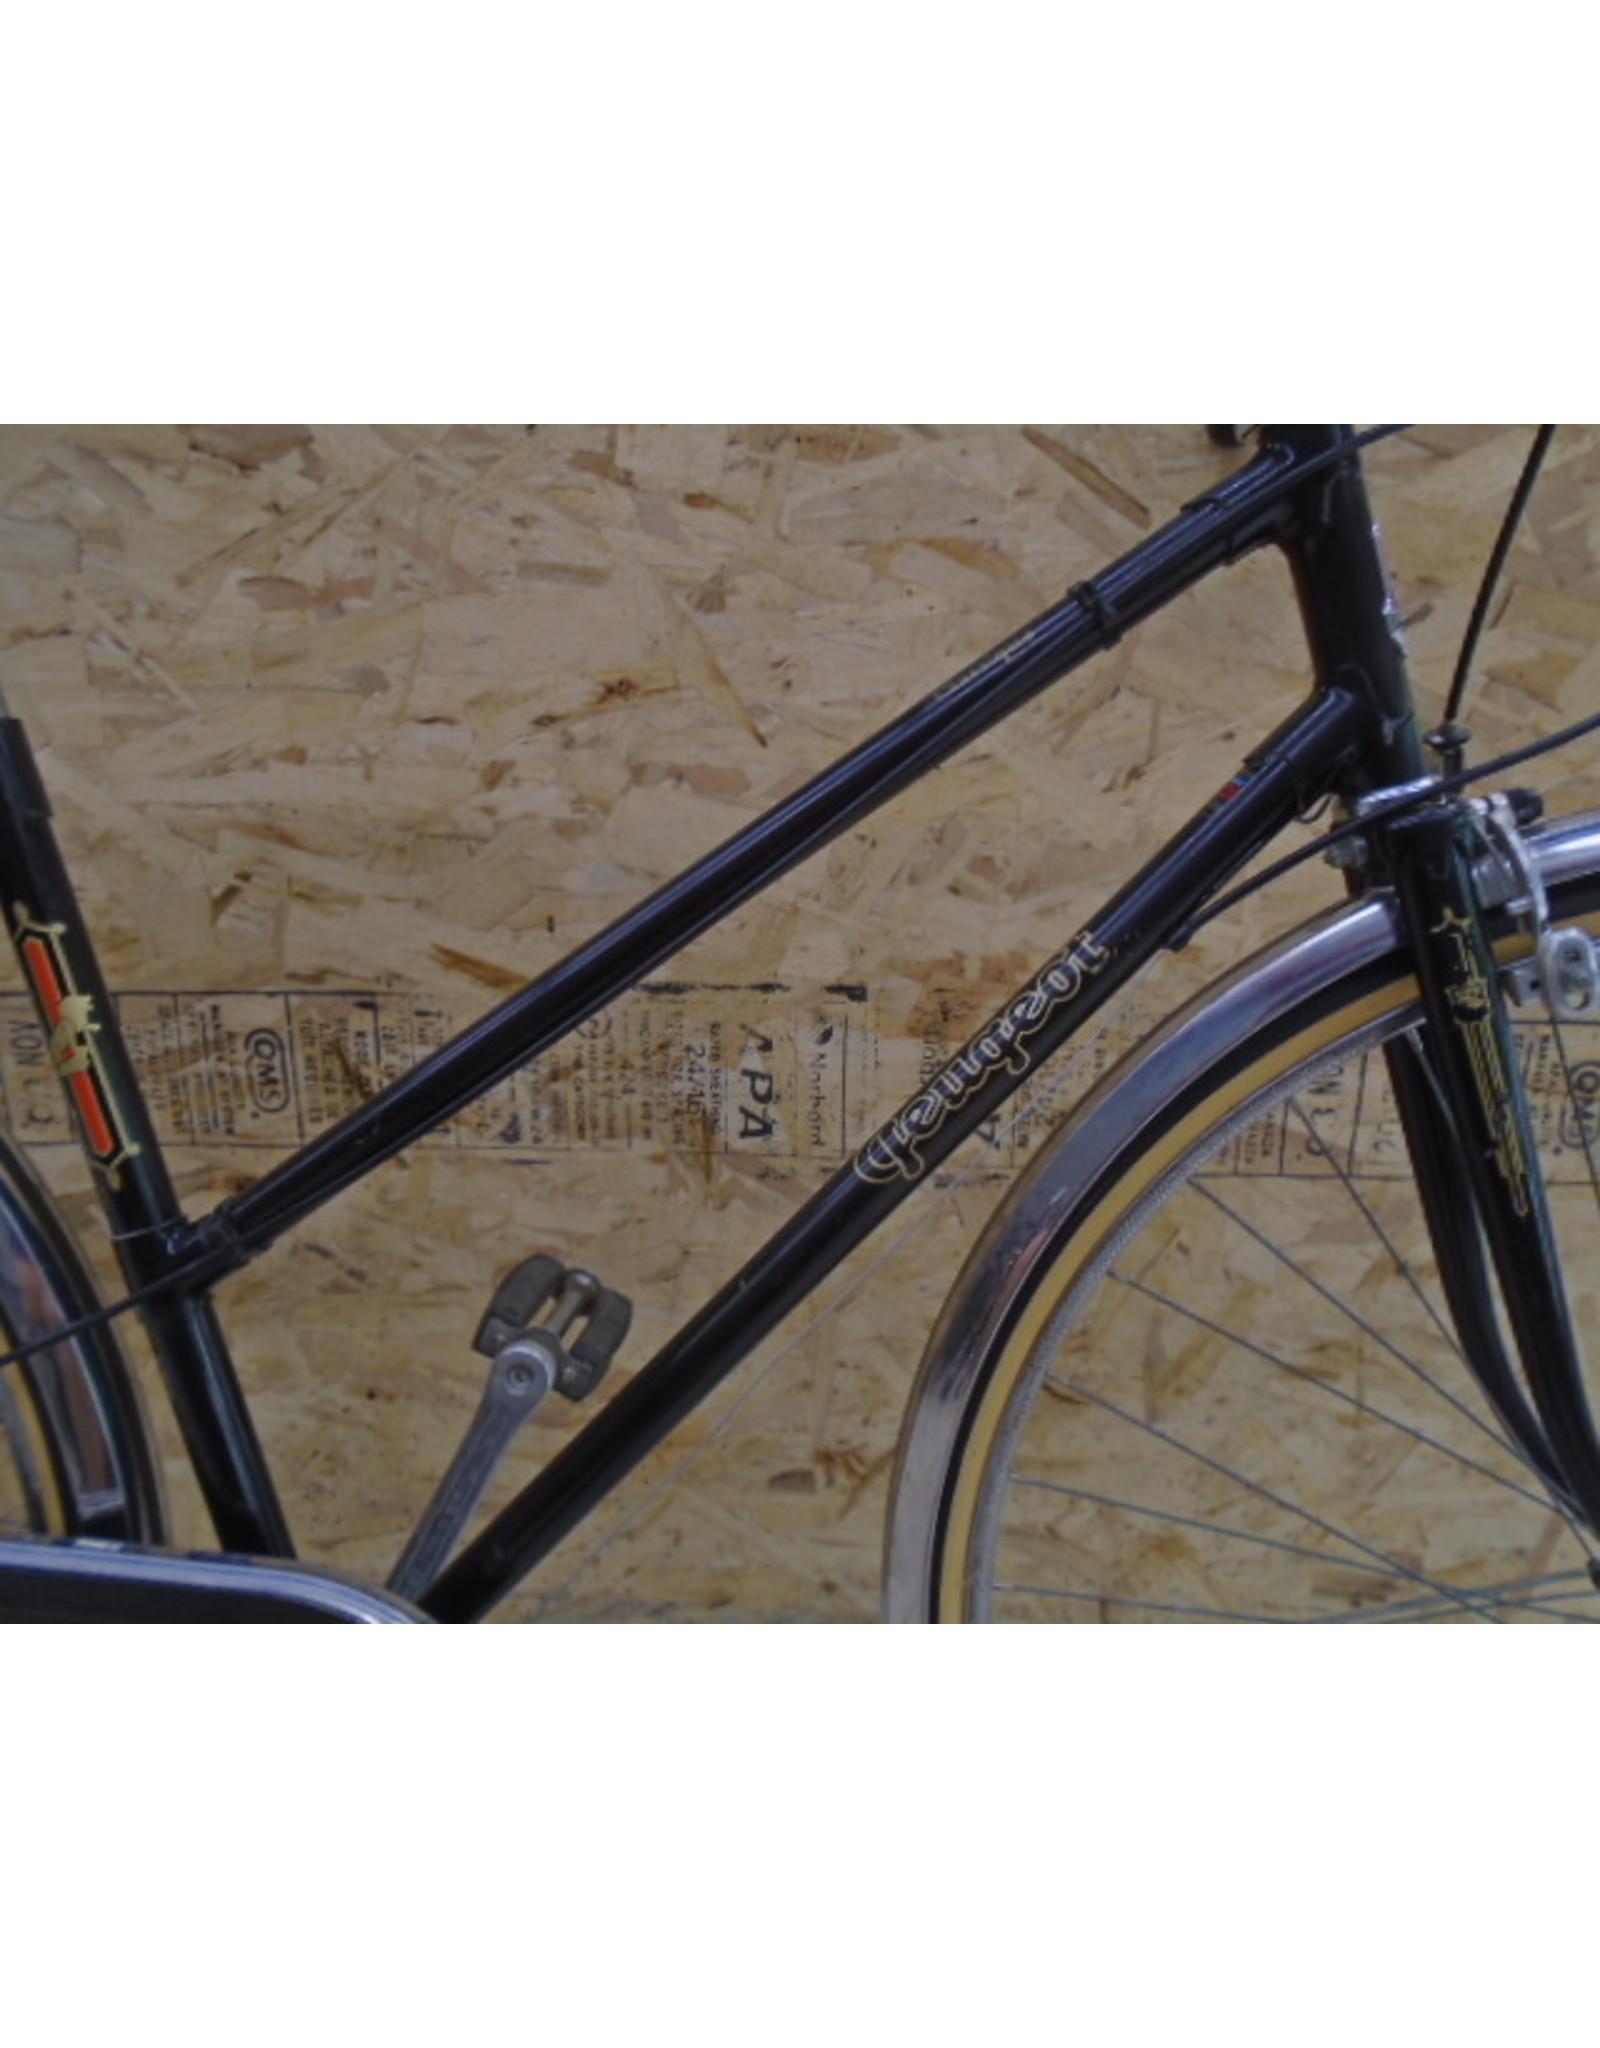 "Peugeot 19 ""used city bike - 8783"